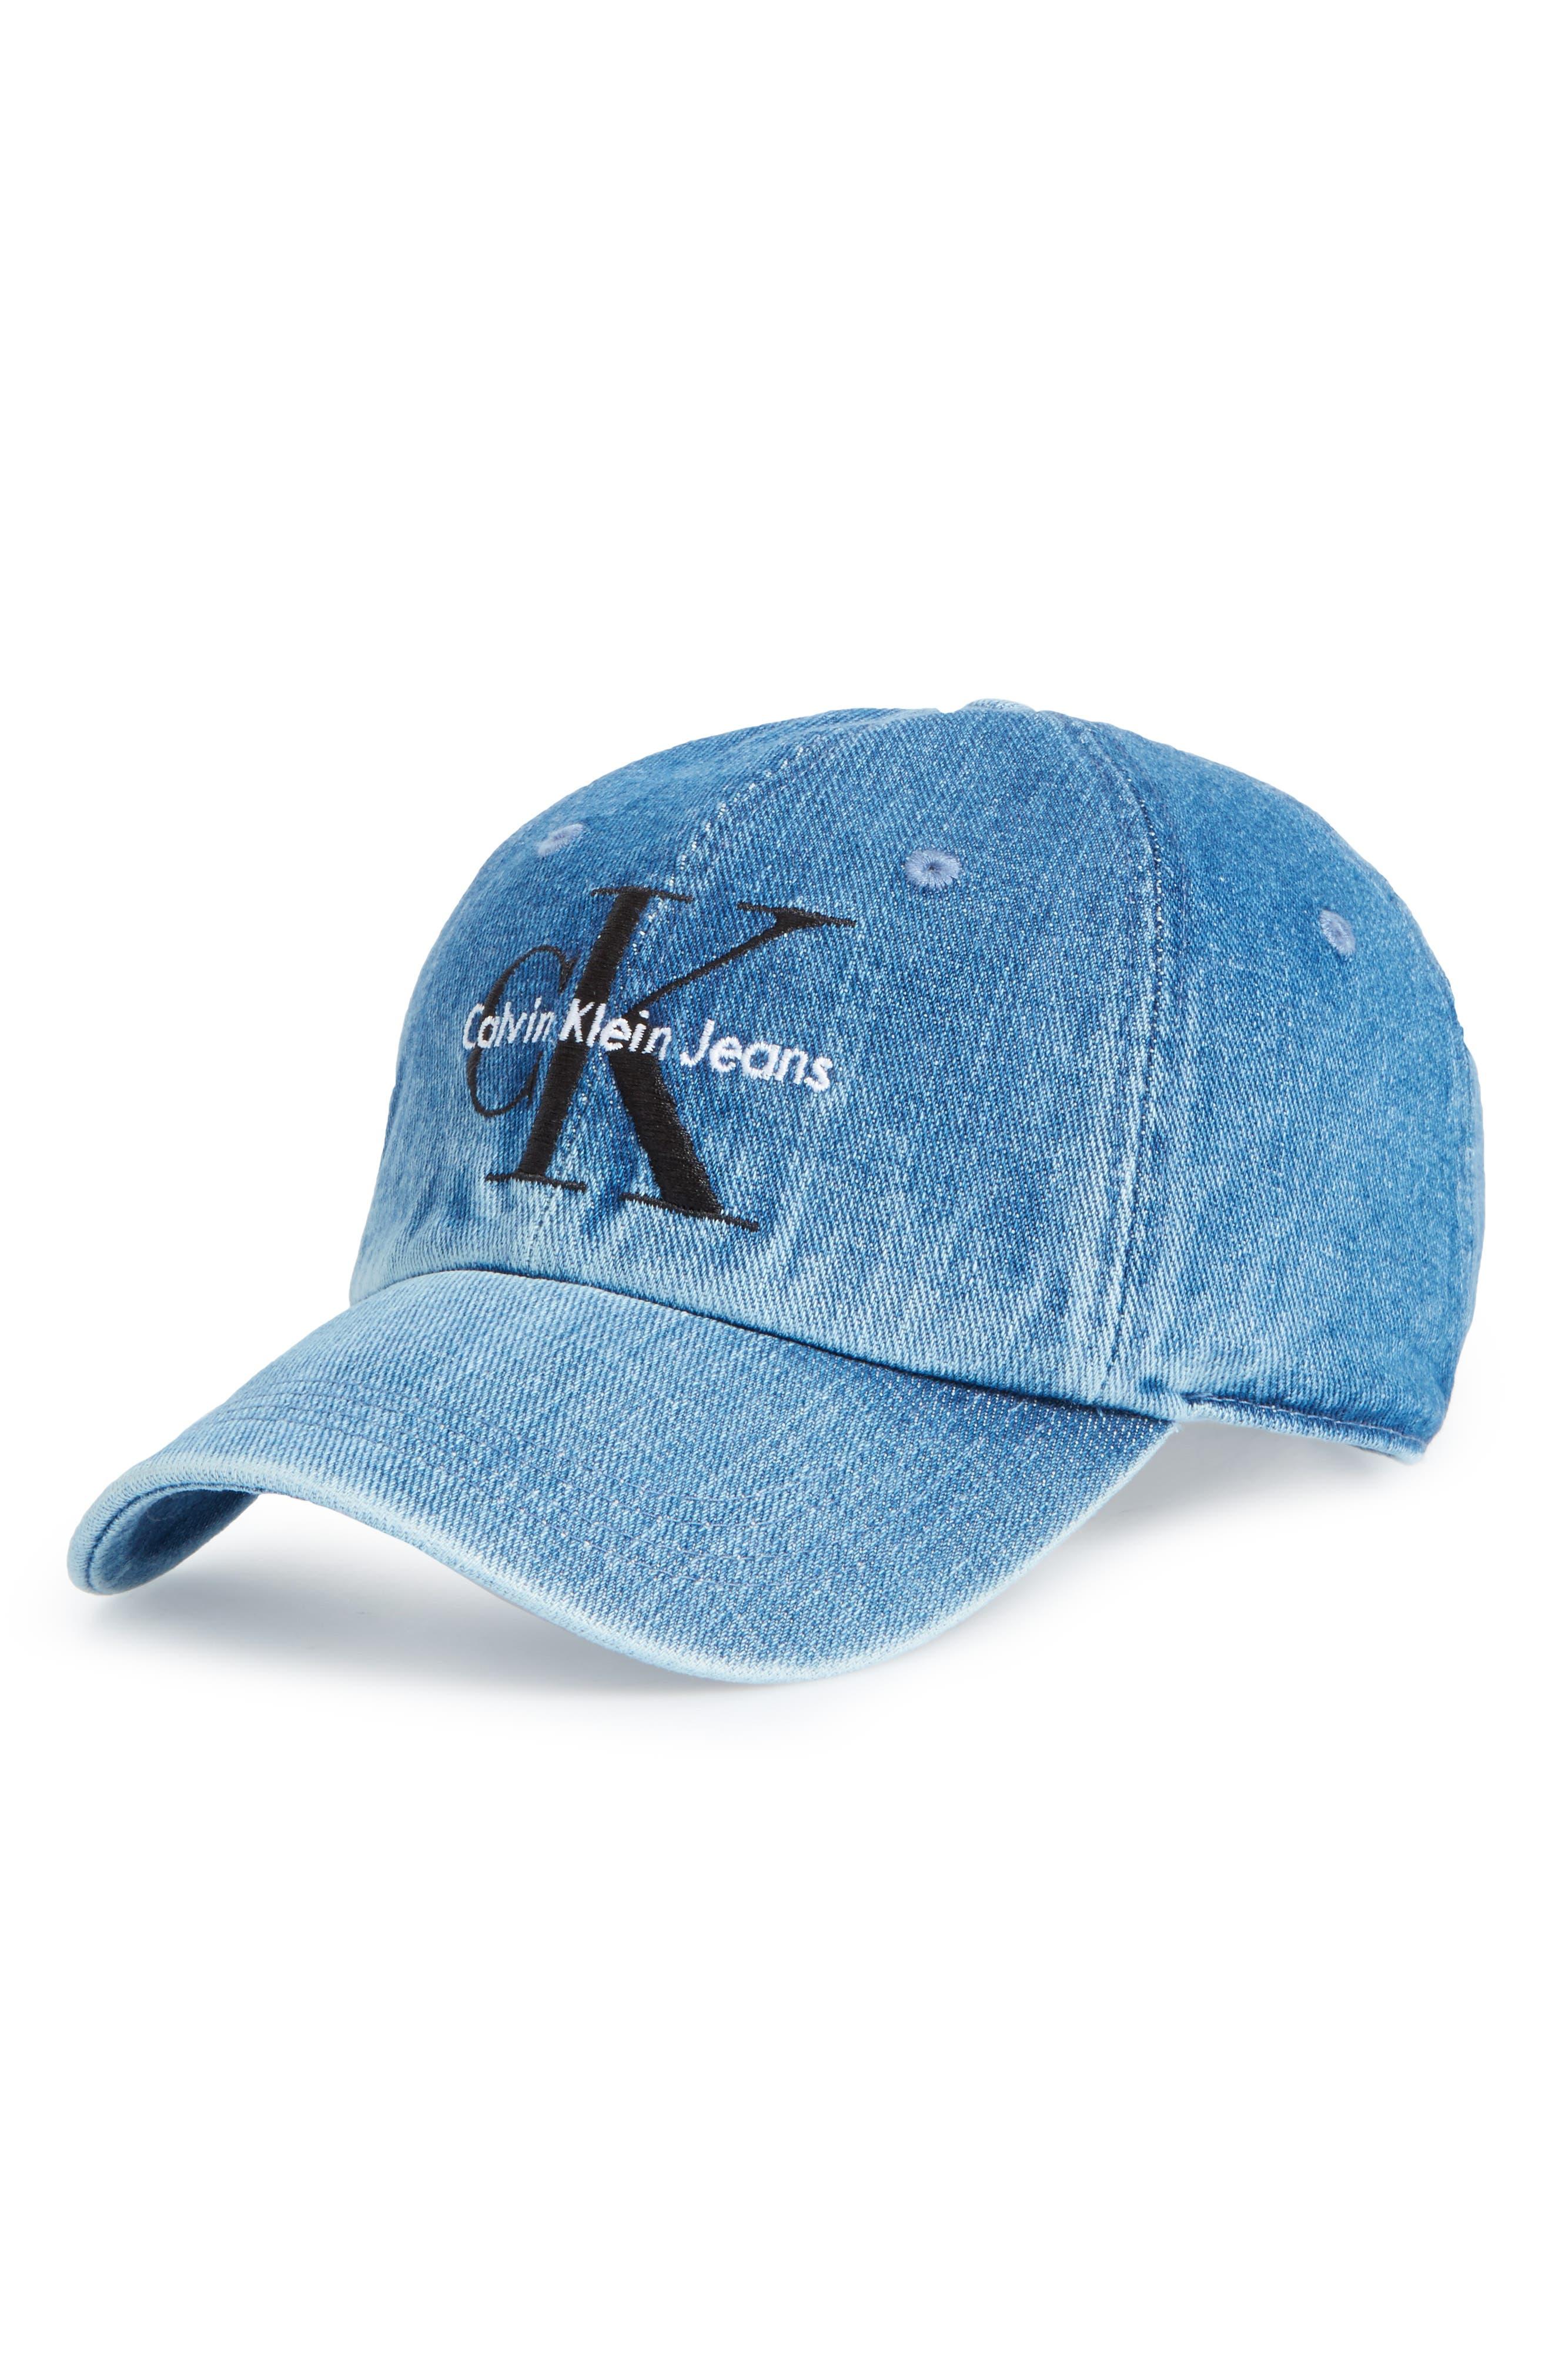 Main Image - Calvin Klein CK Jeans Ball Cap